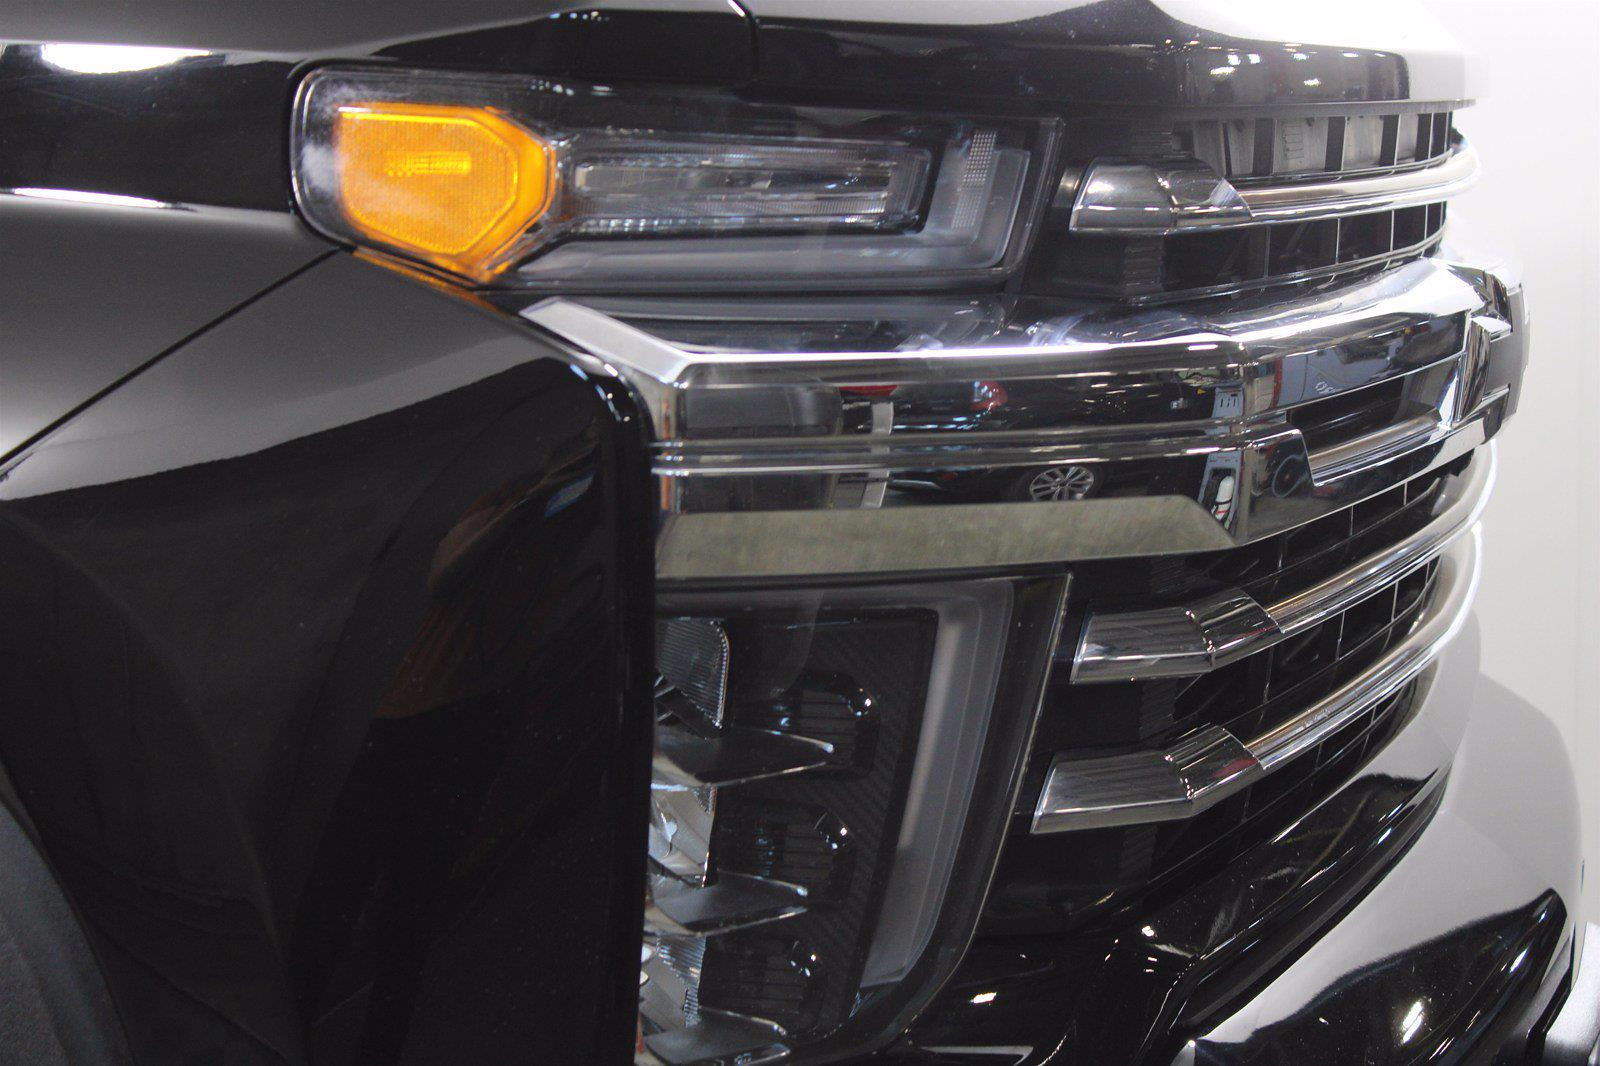 2020 Chevrolet Silverado 3500 Crew Cab 4x4, Pickup #DAZ0421 - photo 4